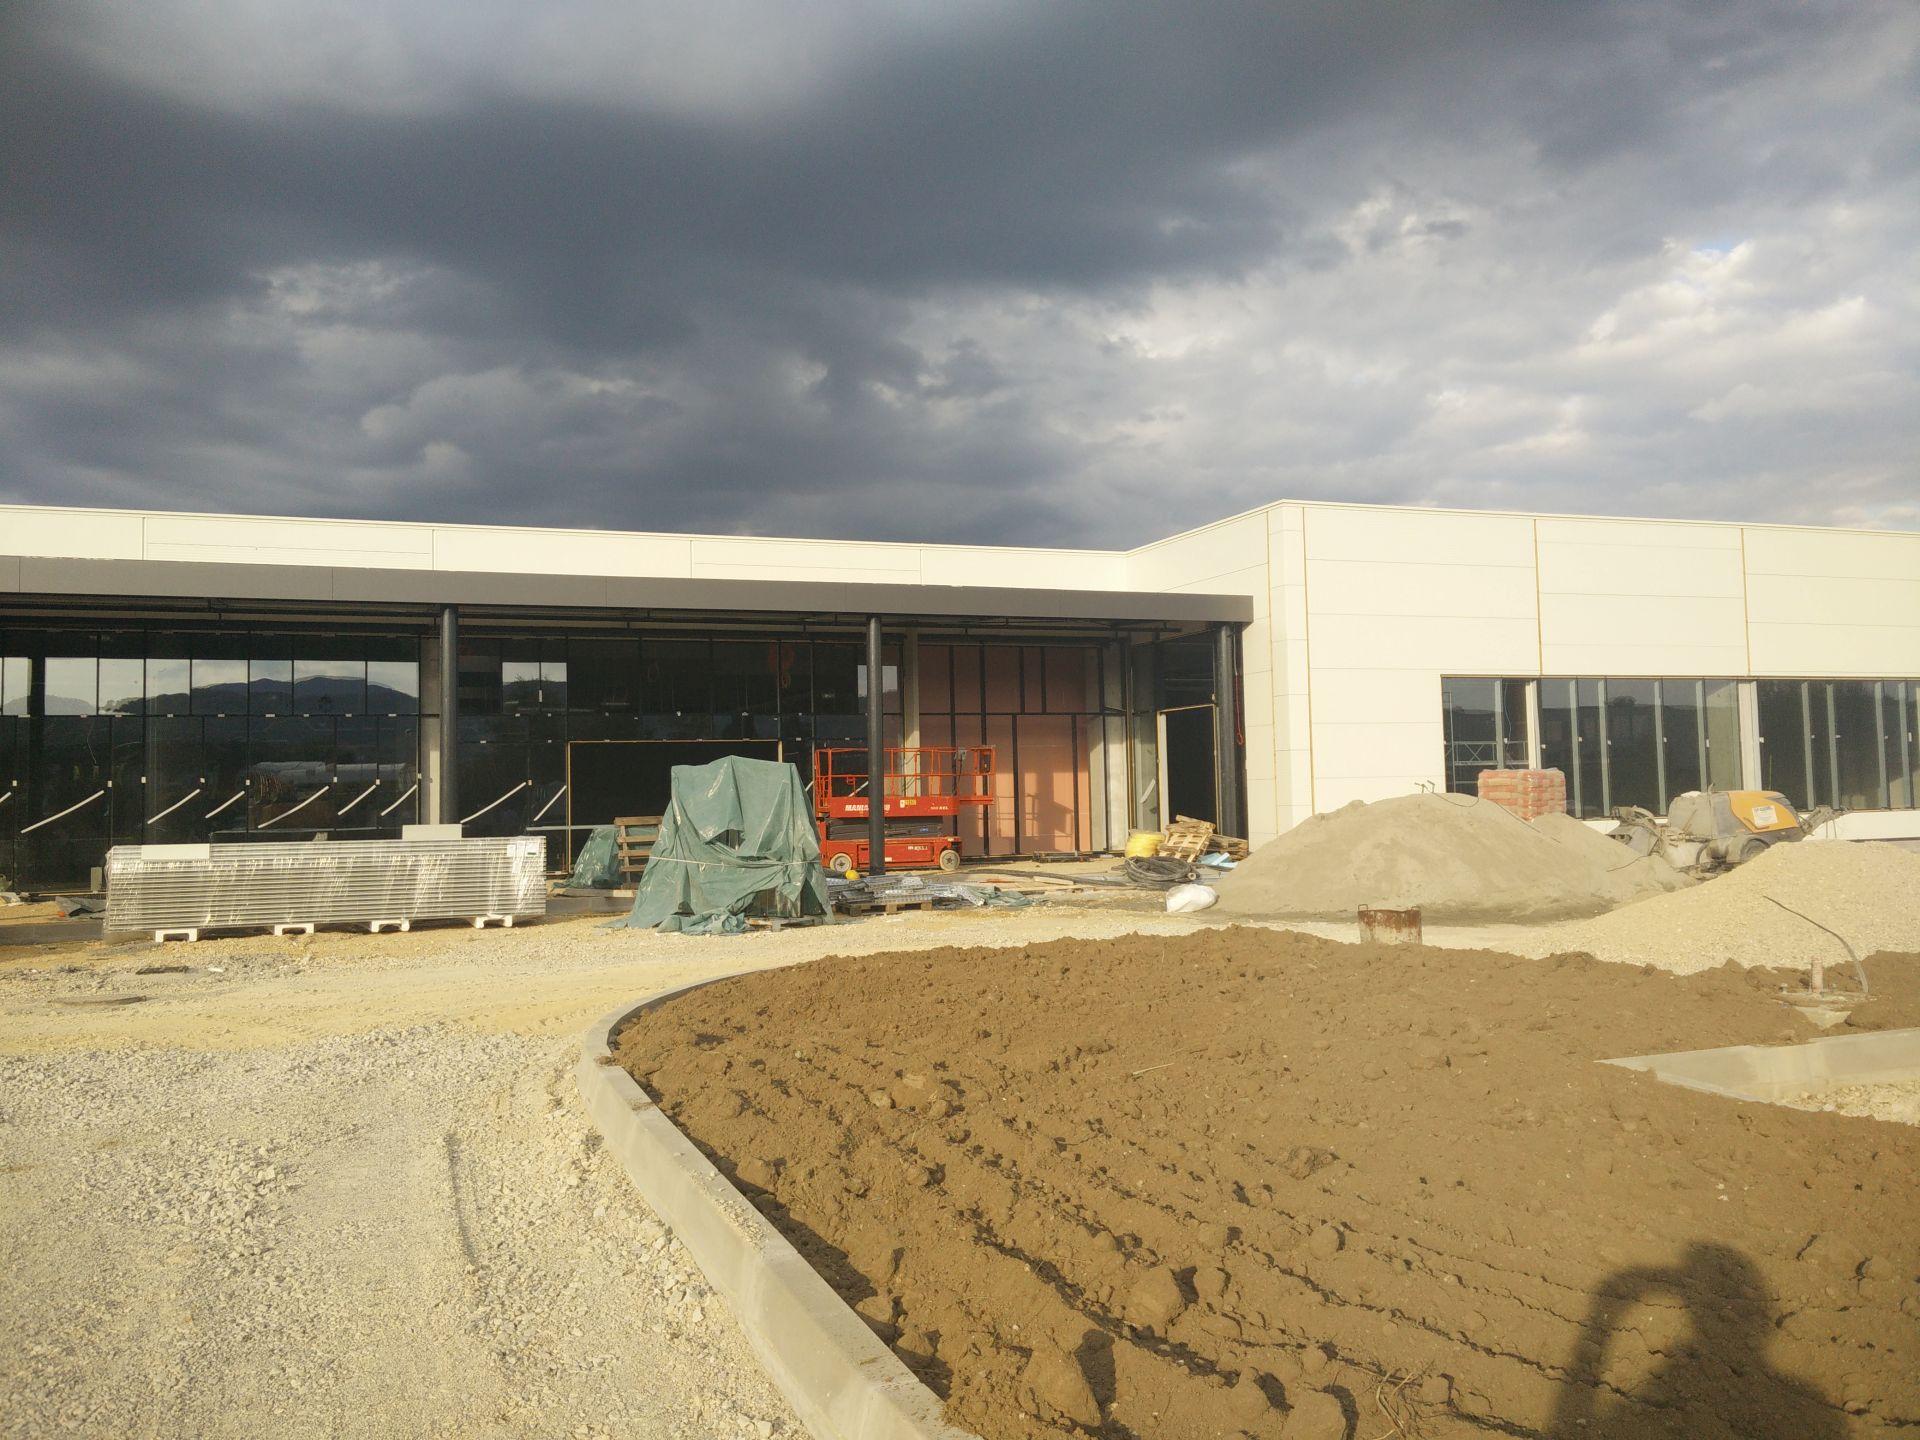 upi-2m, retail park samobor, retail park, trgovački centar samobor, retail samobor, samobor, konstrukcija, beton, concrete, structure,